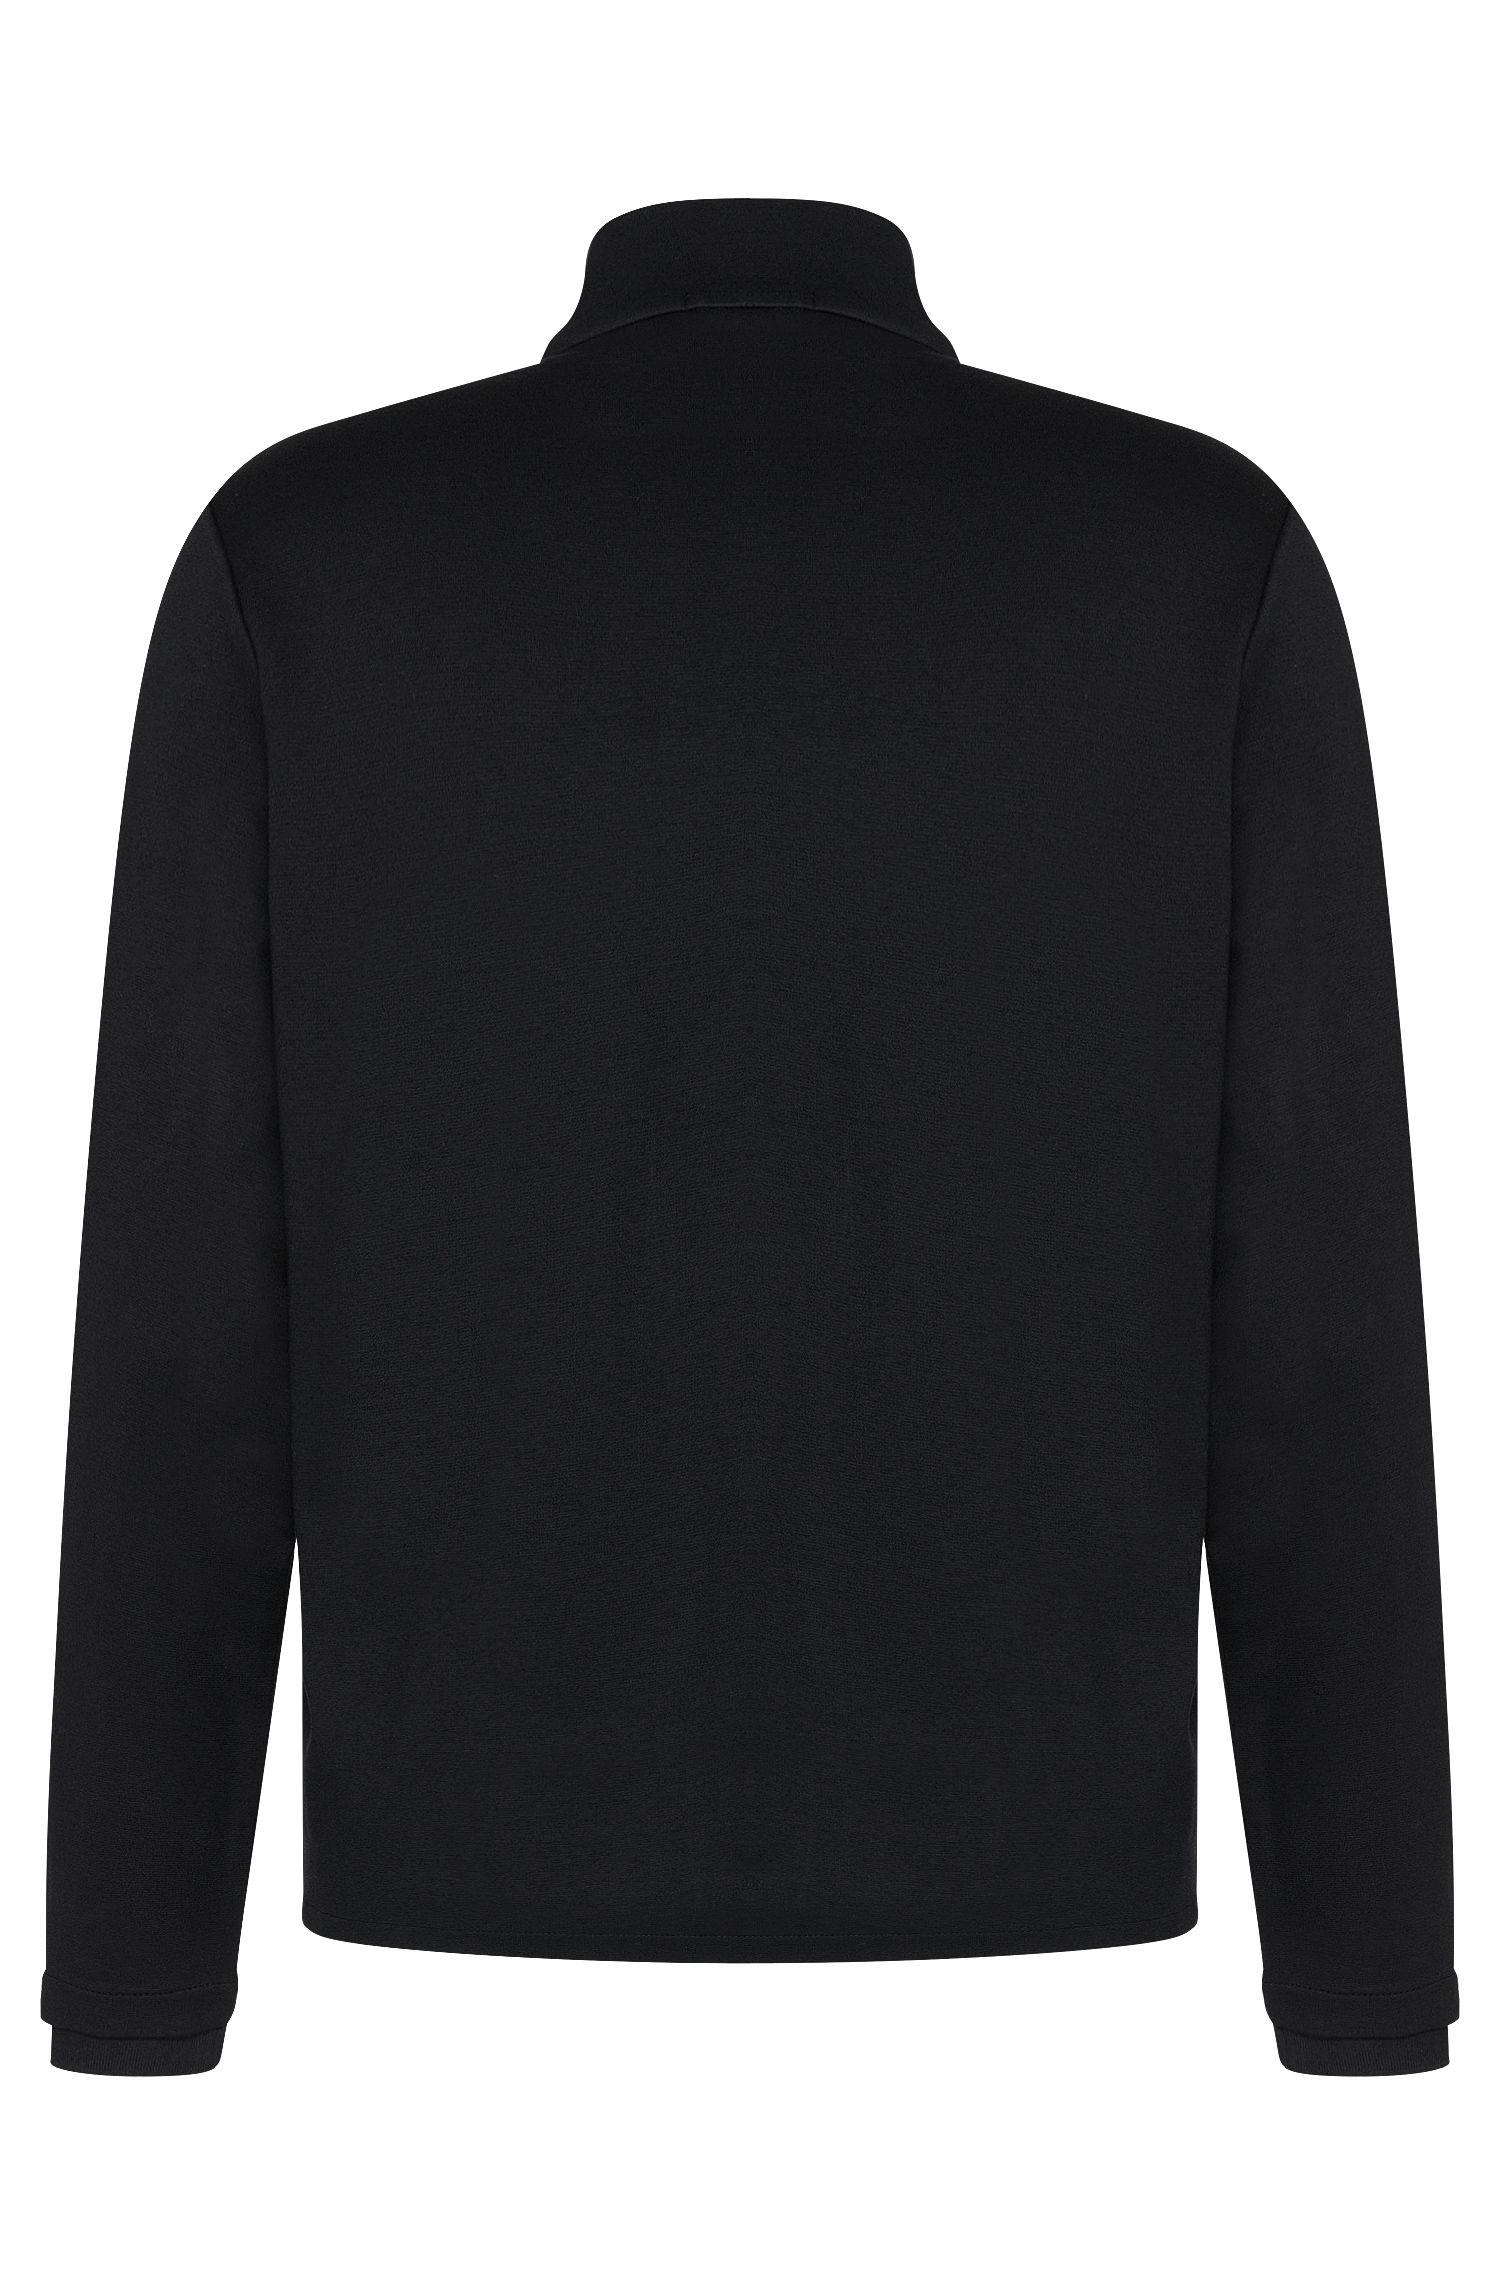 'Sidney' | Mercerized Cotton Troyer Long Sleeve T-Shirt